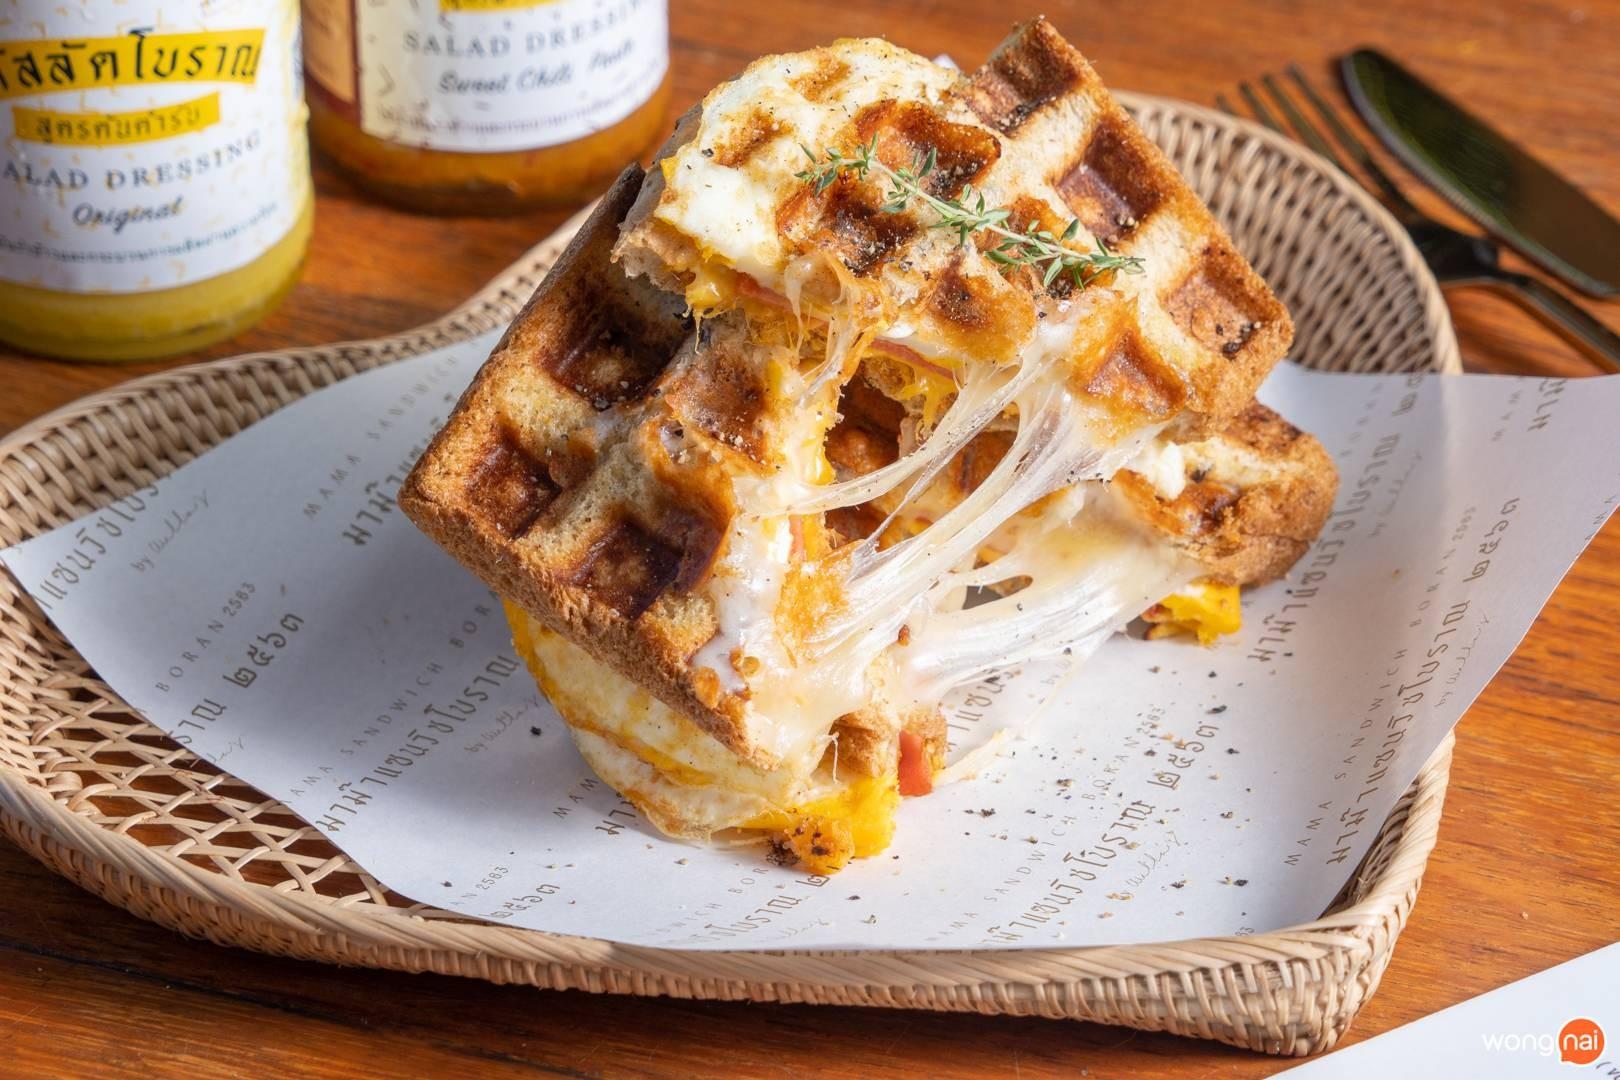 """Sandwich Boran Waffle"" (159.-) หรือจะเรียกวาฟเฟิลตู้มต้ามก็ได้"